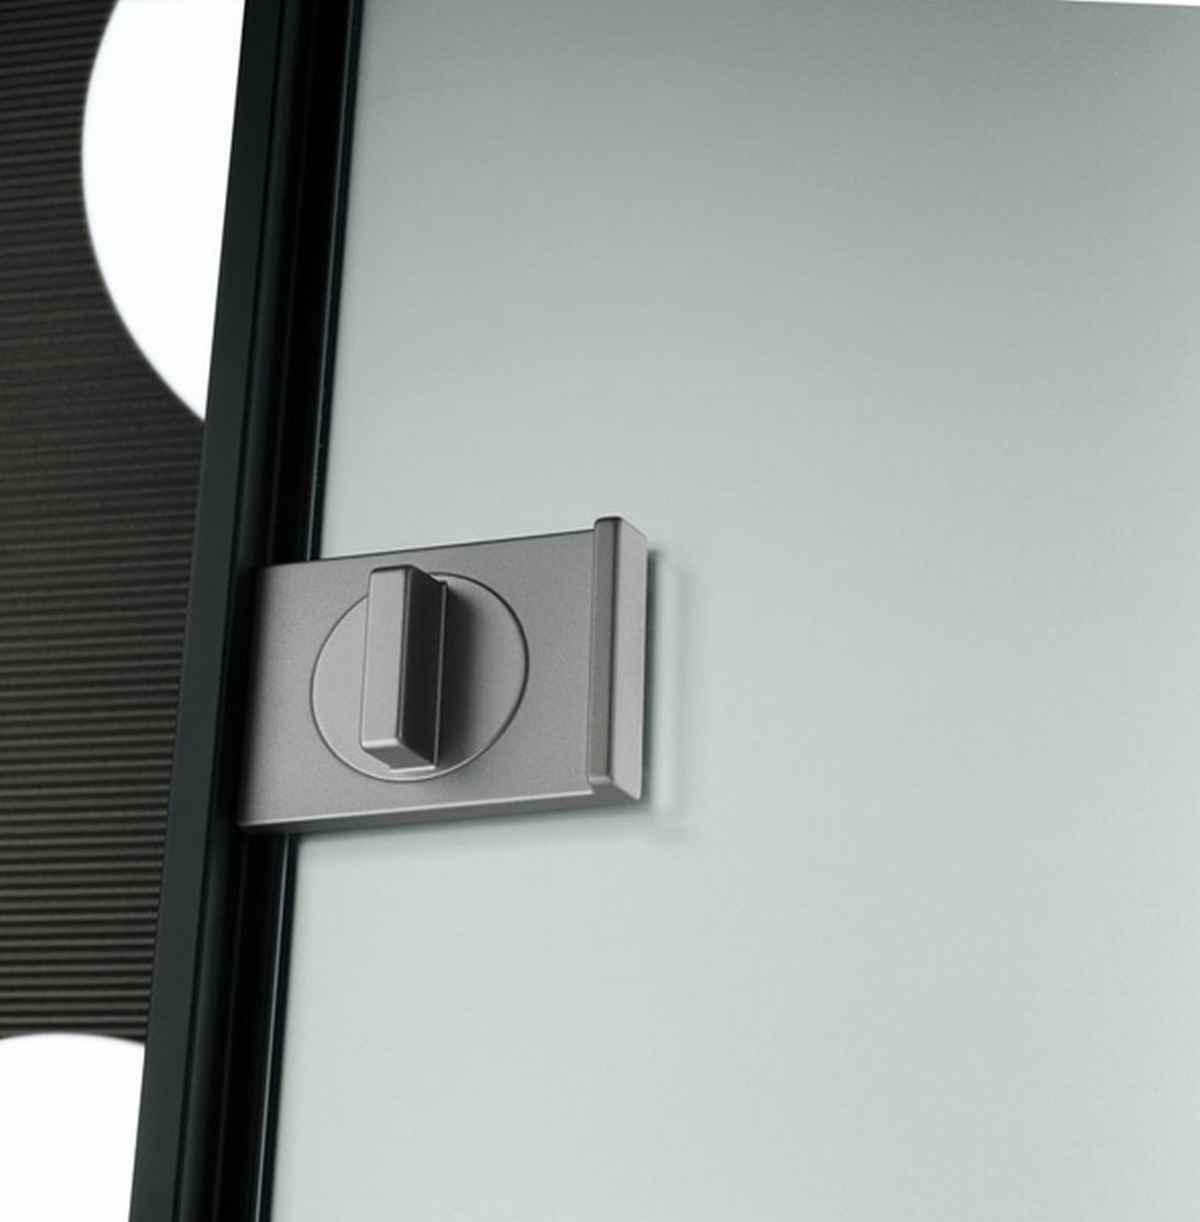 Automatic Sliding Glass Door Locks